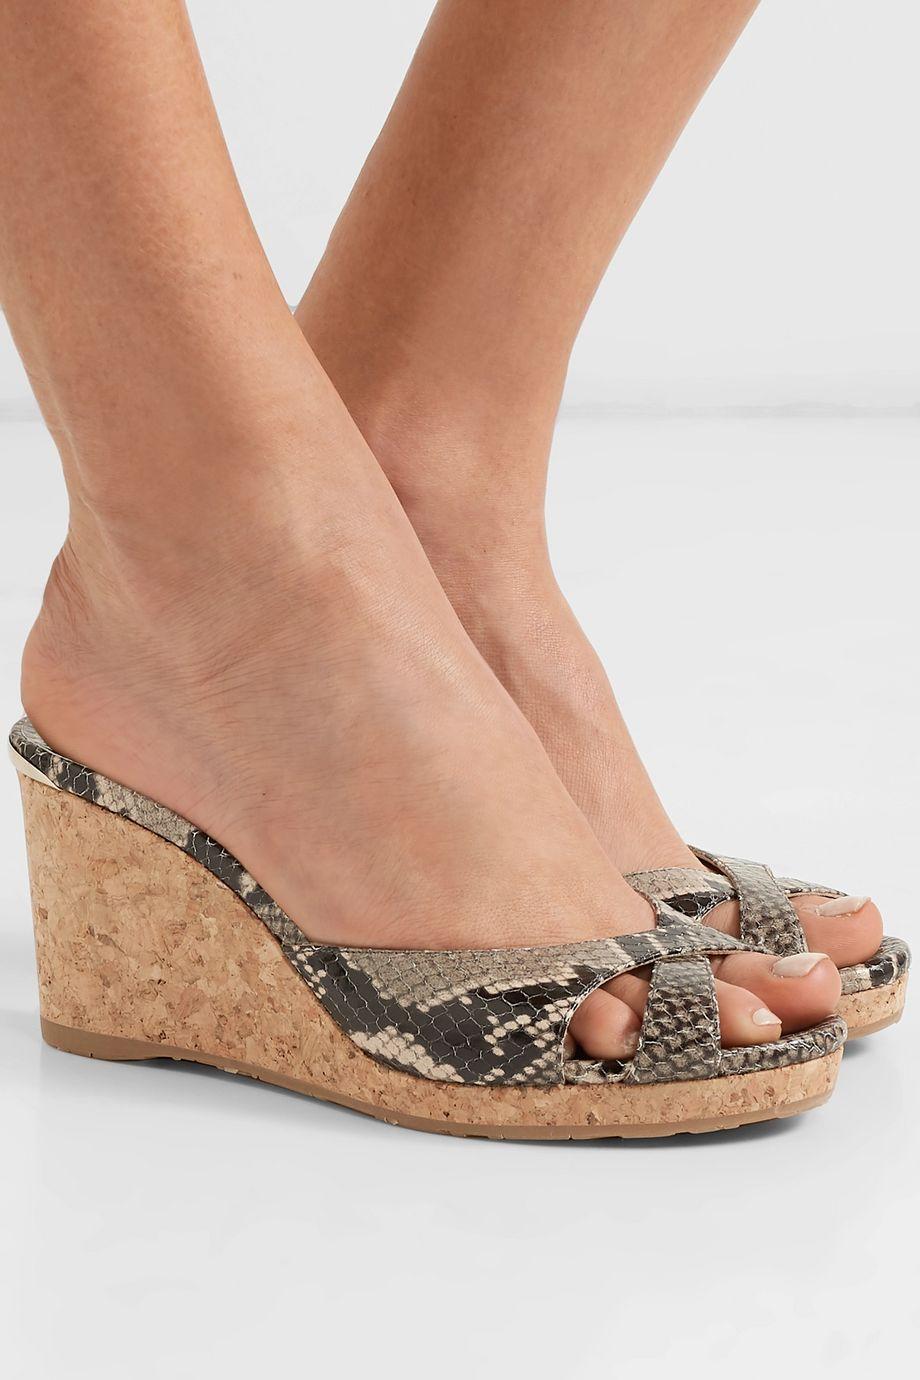 Jimmy Choo Almer 80 snake-effect leather wedge sandals